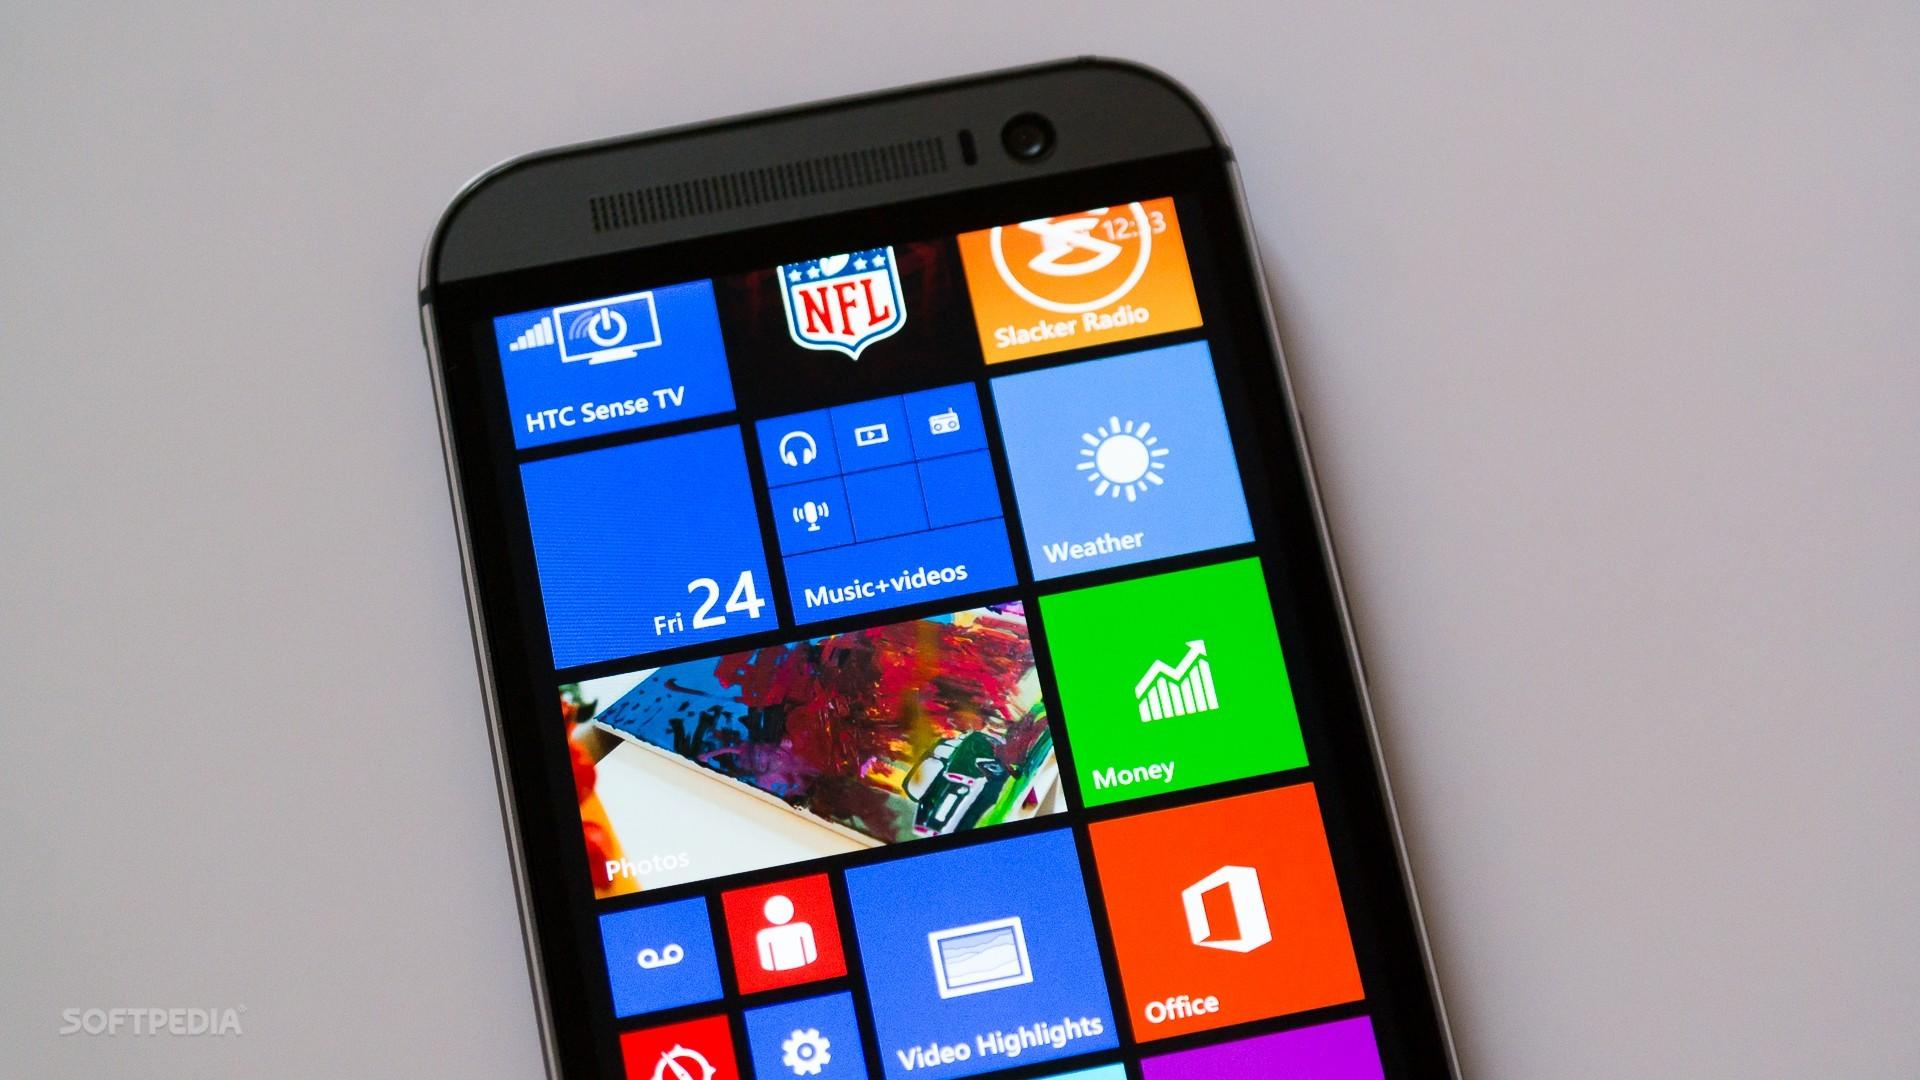 HTC M9 to Pack 5 5-Inch Quad HD Display, 3GB RAM and 3500 mAh